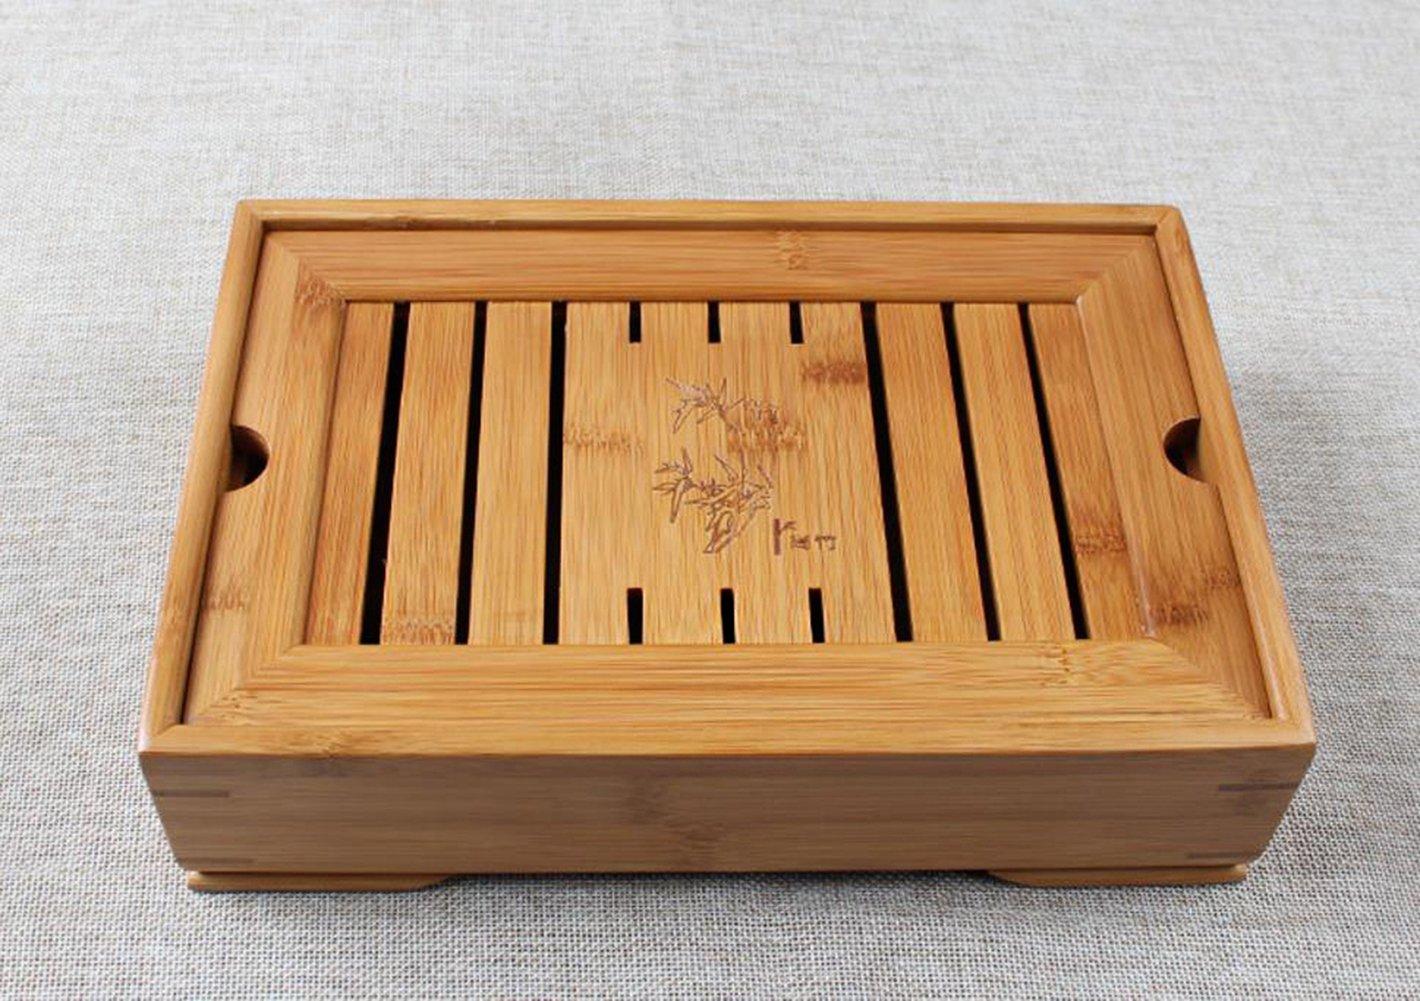 Hoobar Reservoir Type Bamboo Tea Tray - Chinese Kungfu Tea Table Serving Tray Box for Kungfu Tea Set by JKCOM (Image #7)